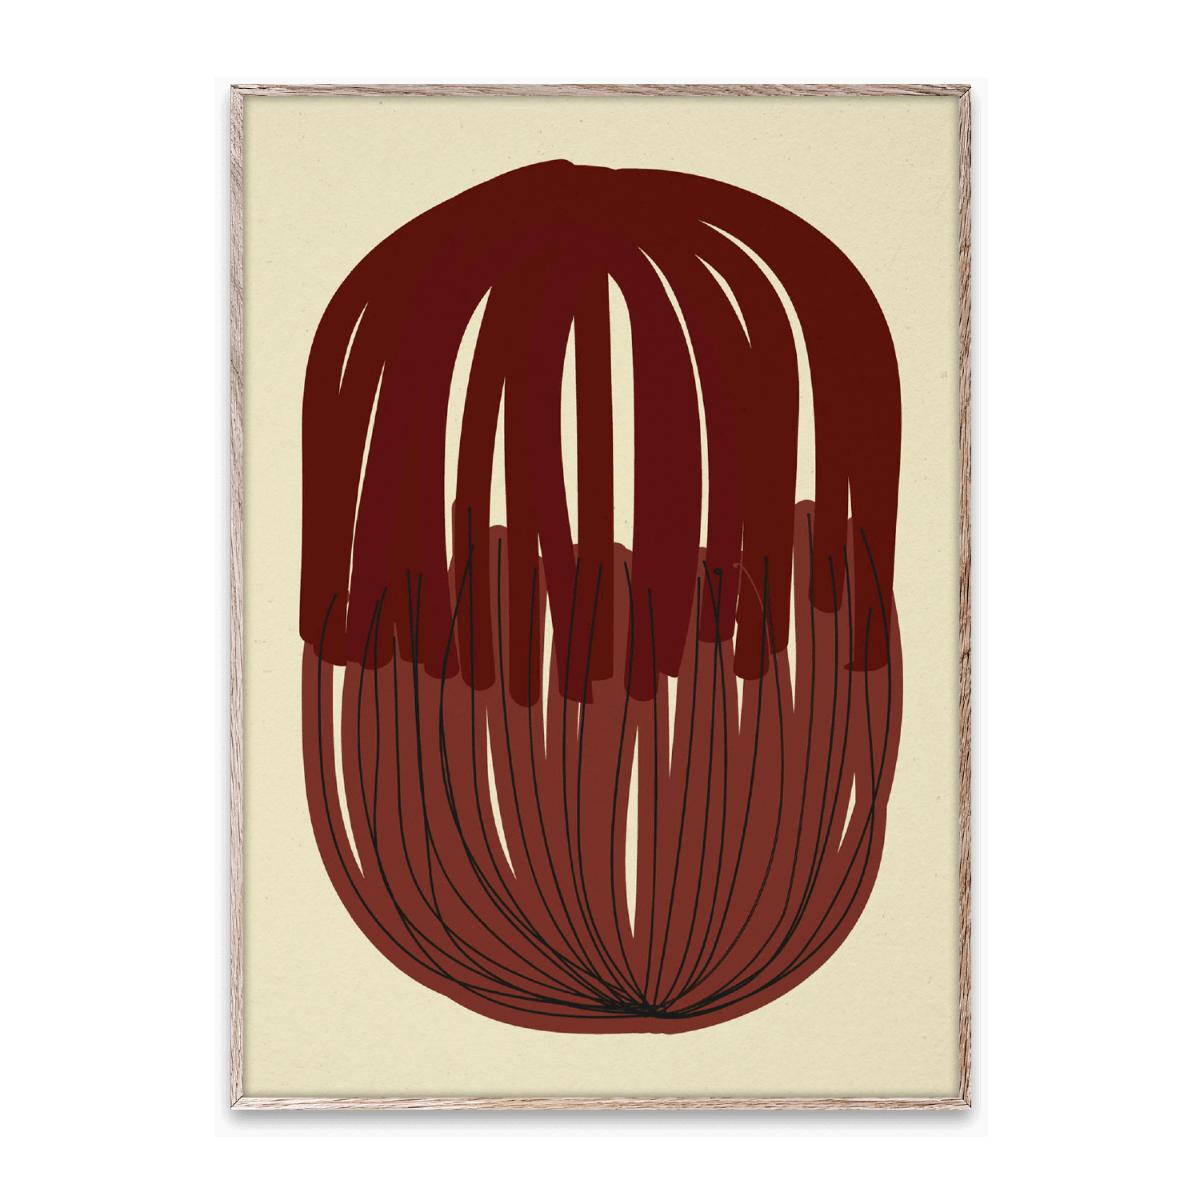 Designtorget Poster Stacked Lines 01 30x40 cm